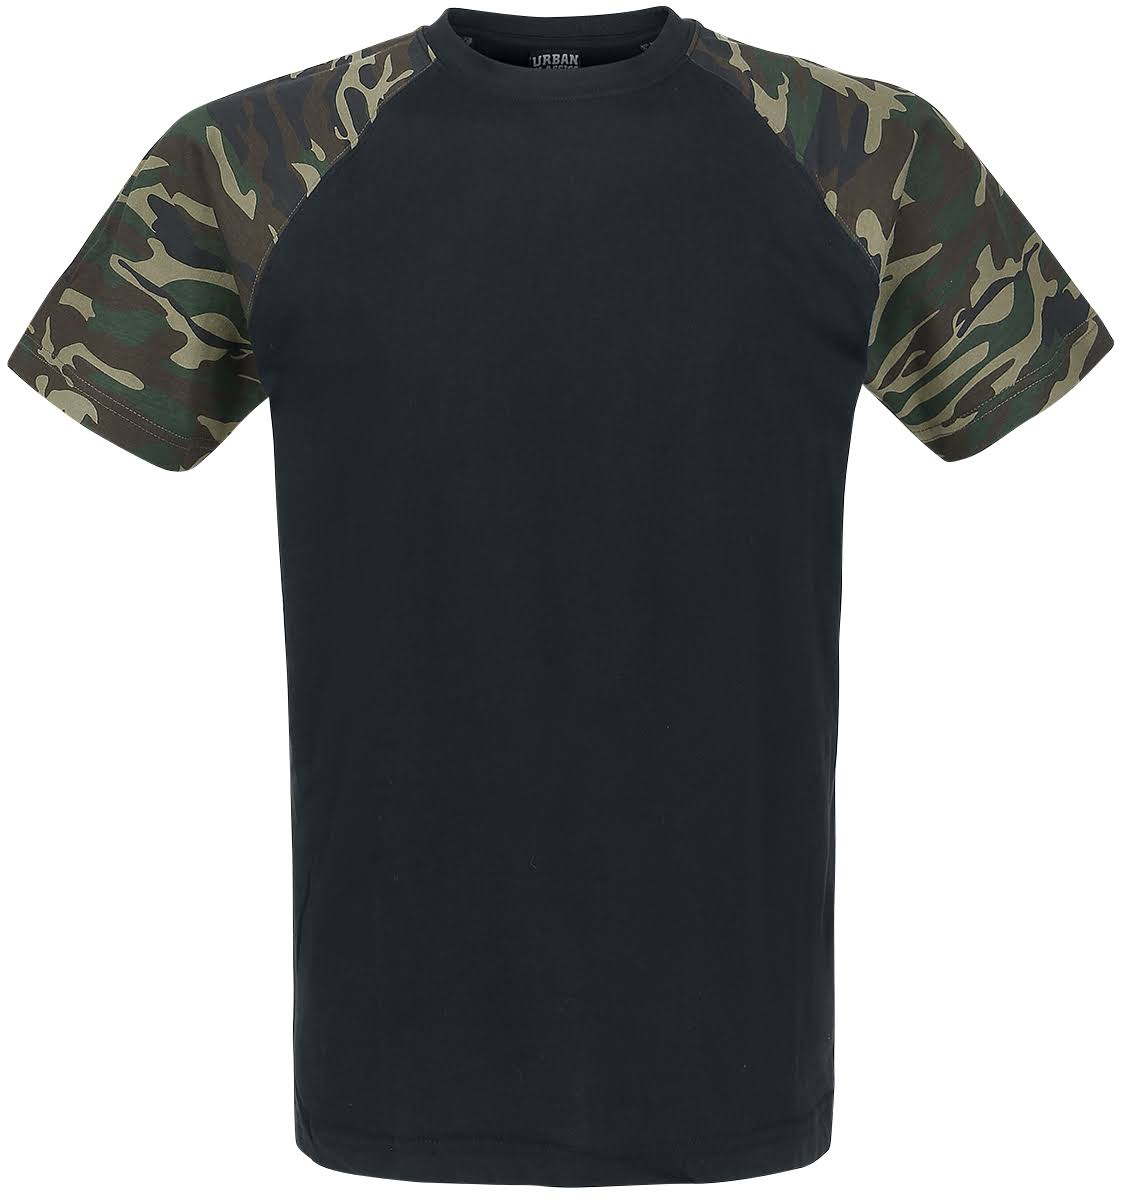 Raglan Urban Negro Camiseta Madera Contraste Classics Camo qvwtrvS